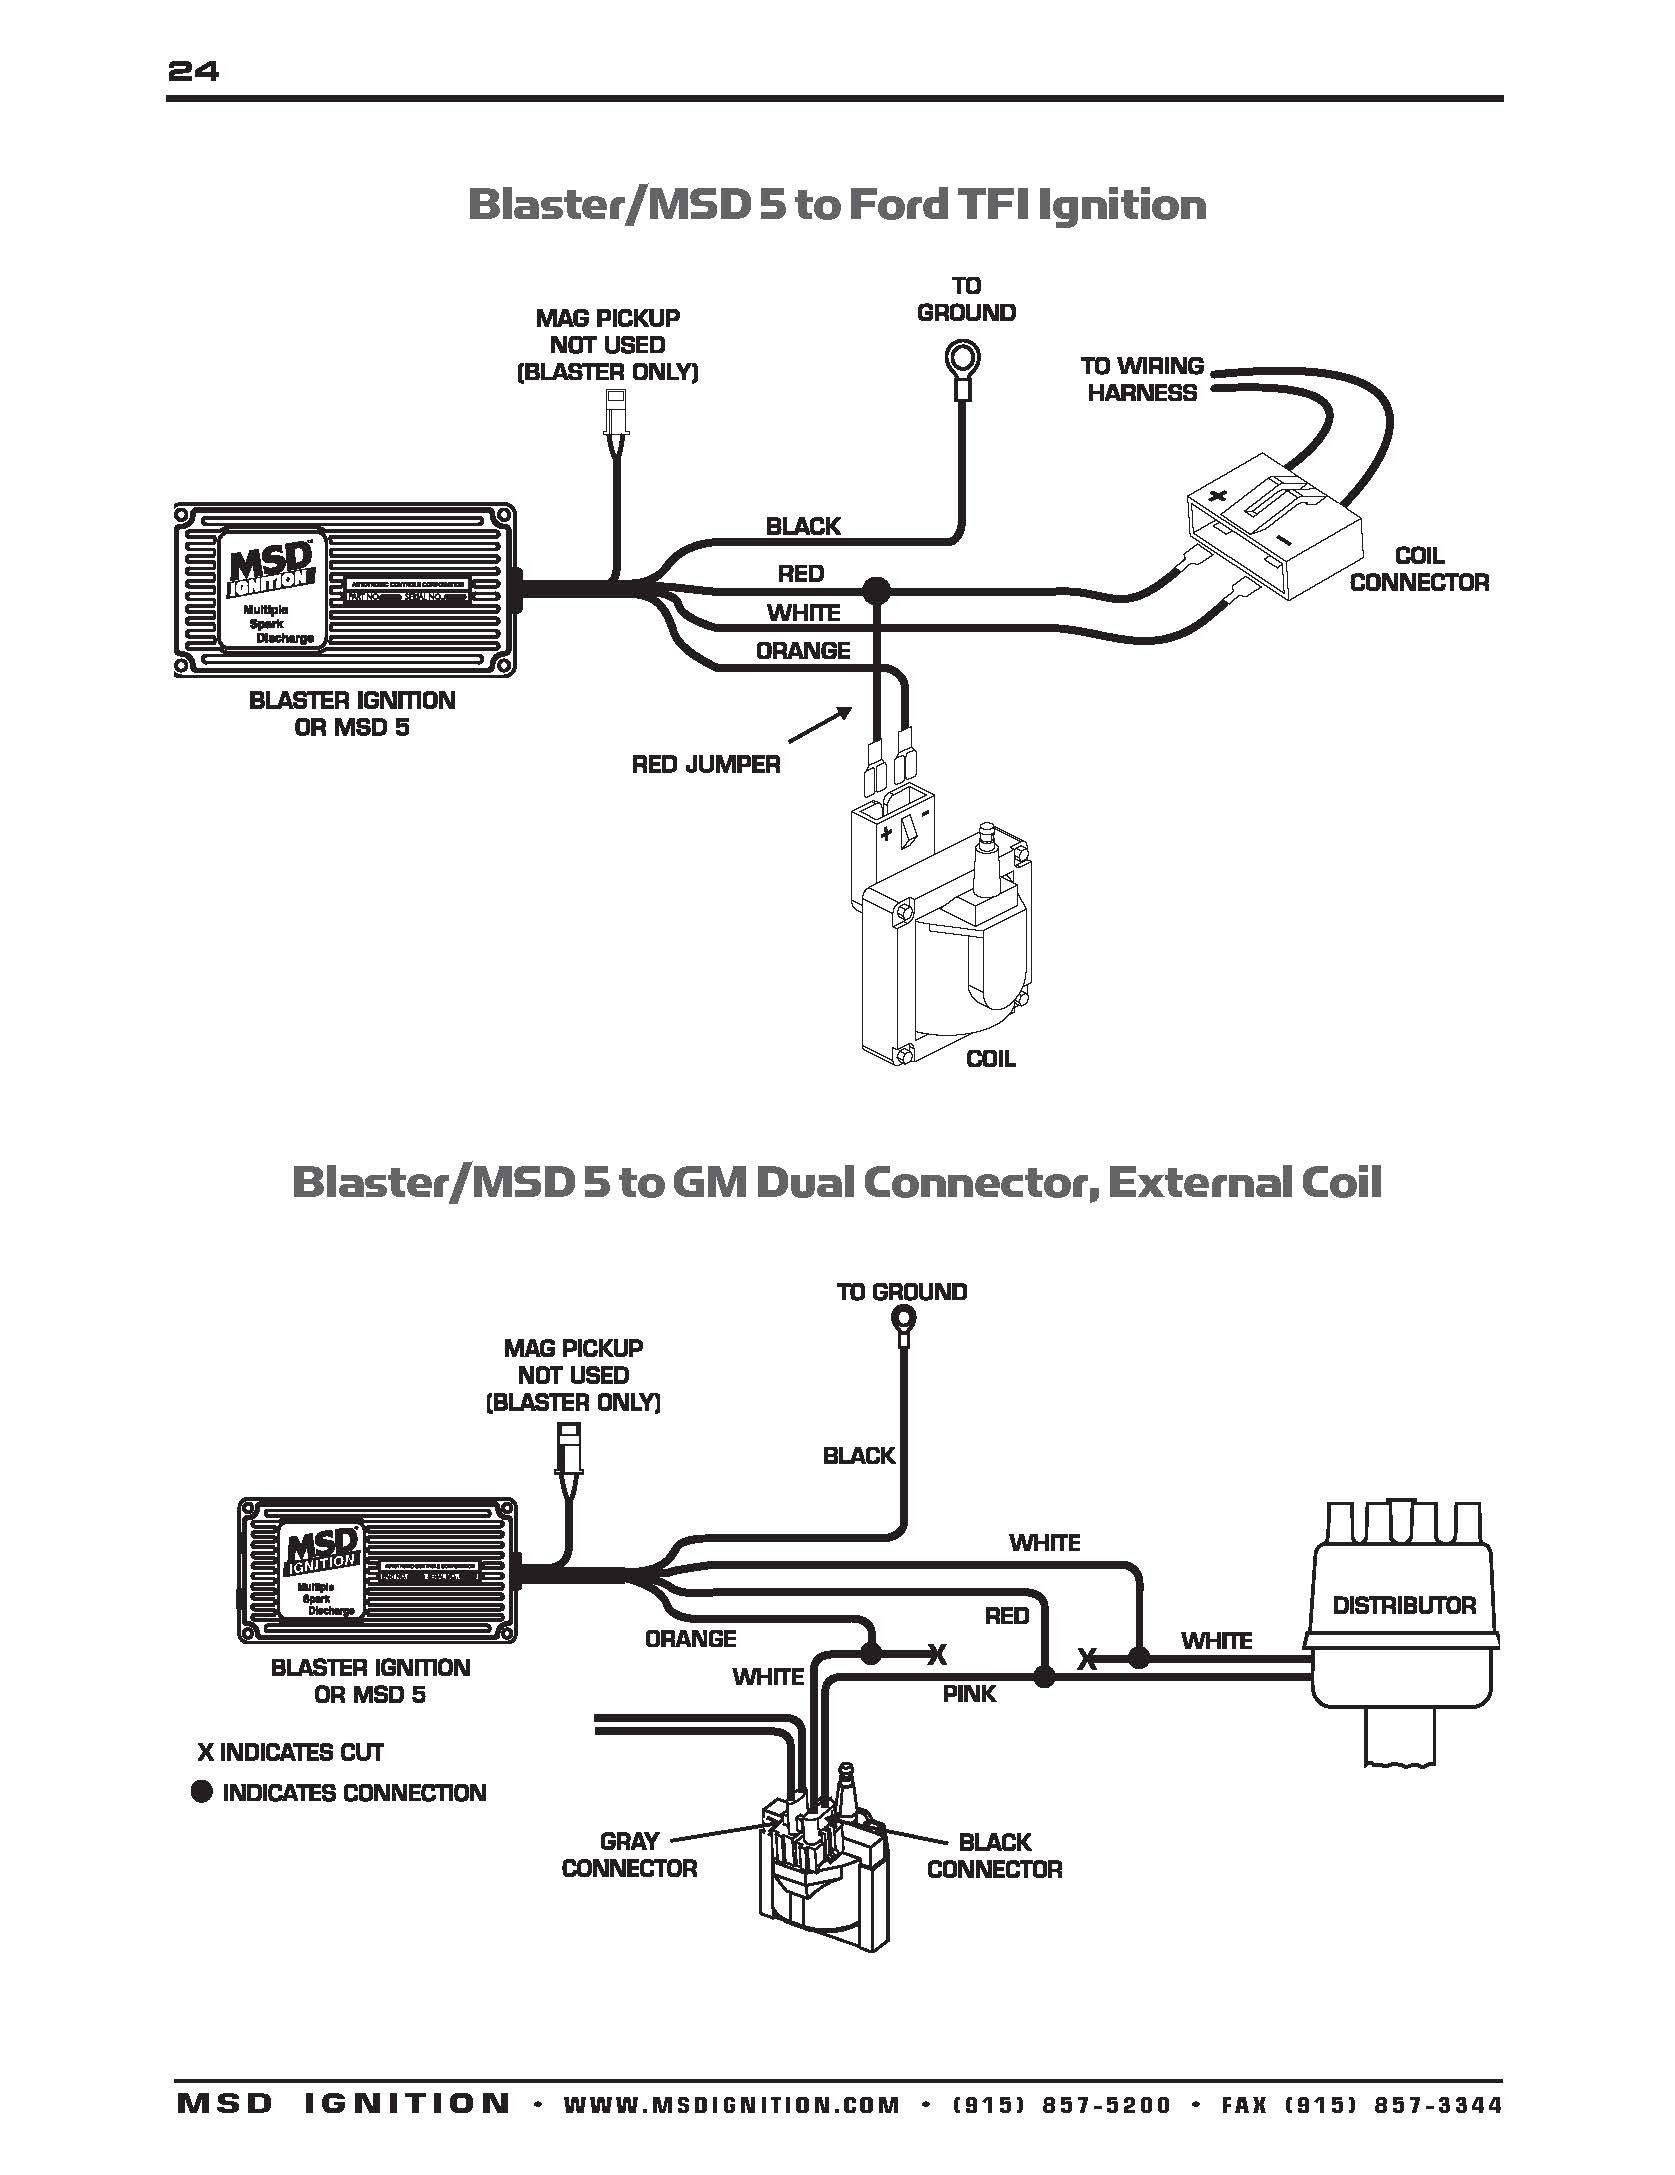 Distributor Wiring Diagram : distributor, wiring, diagram, Distributor, Wiring, Diagram, Ignite,, Ignition, Coil,